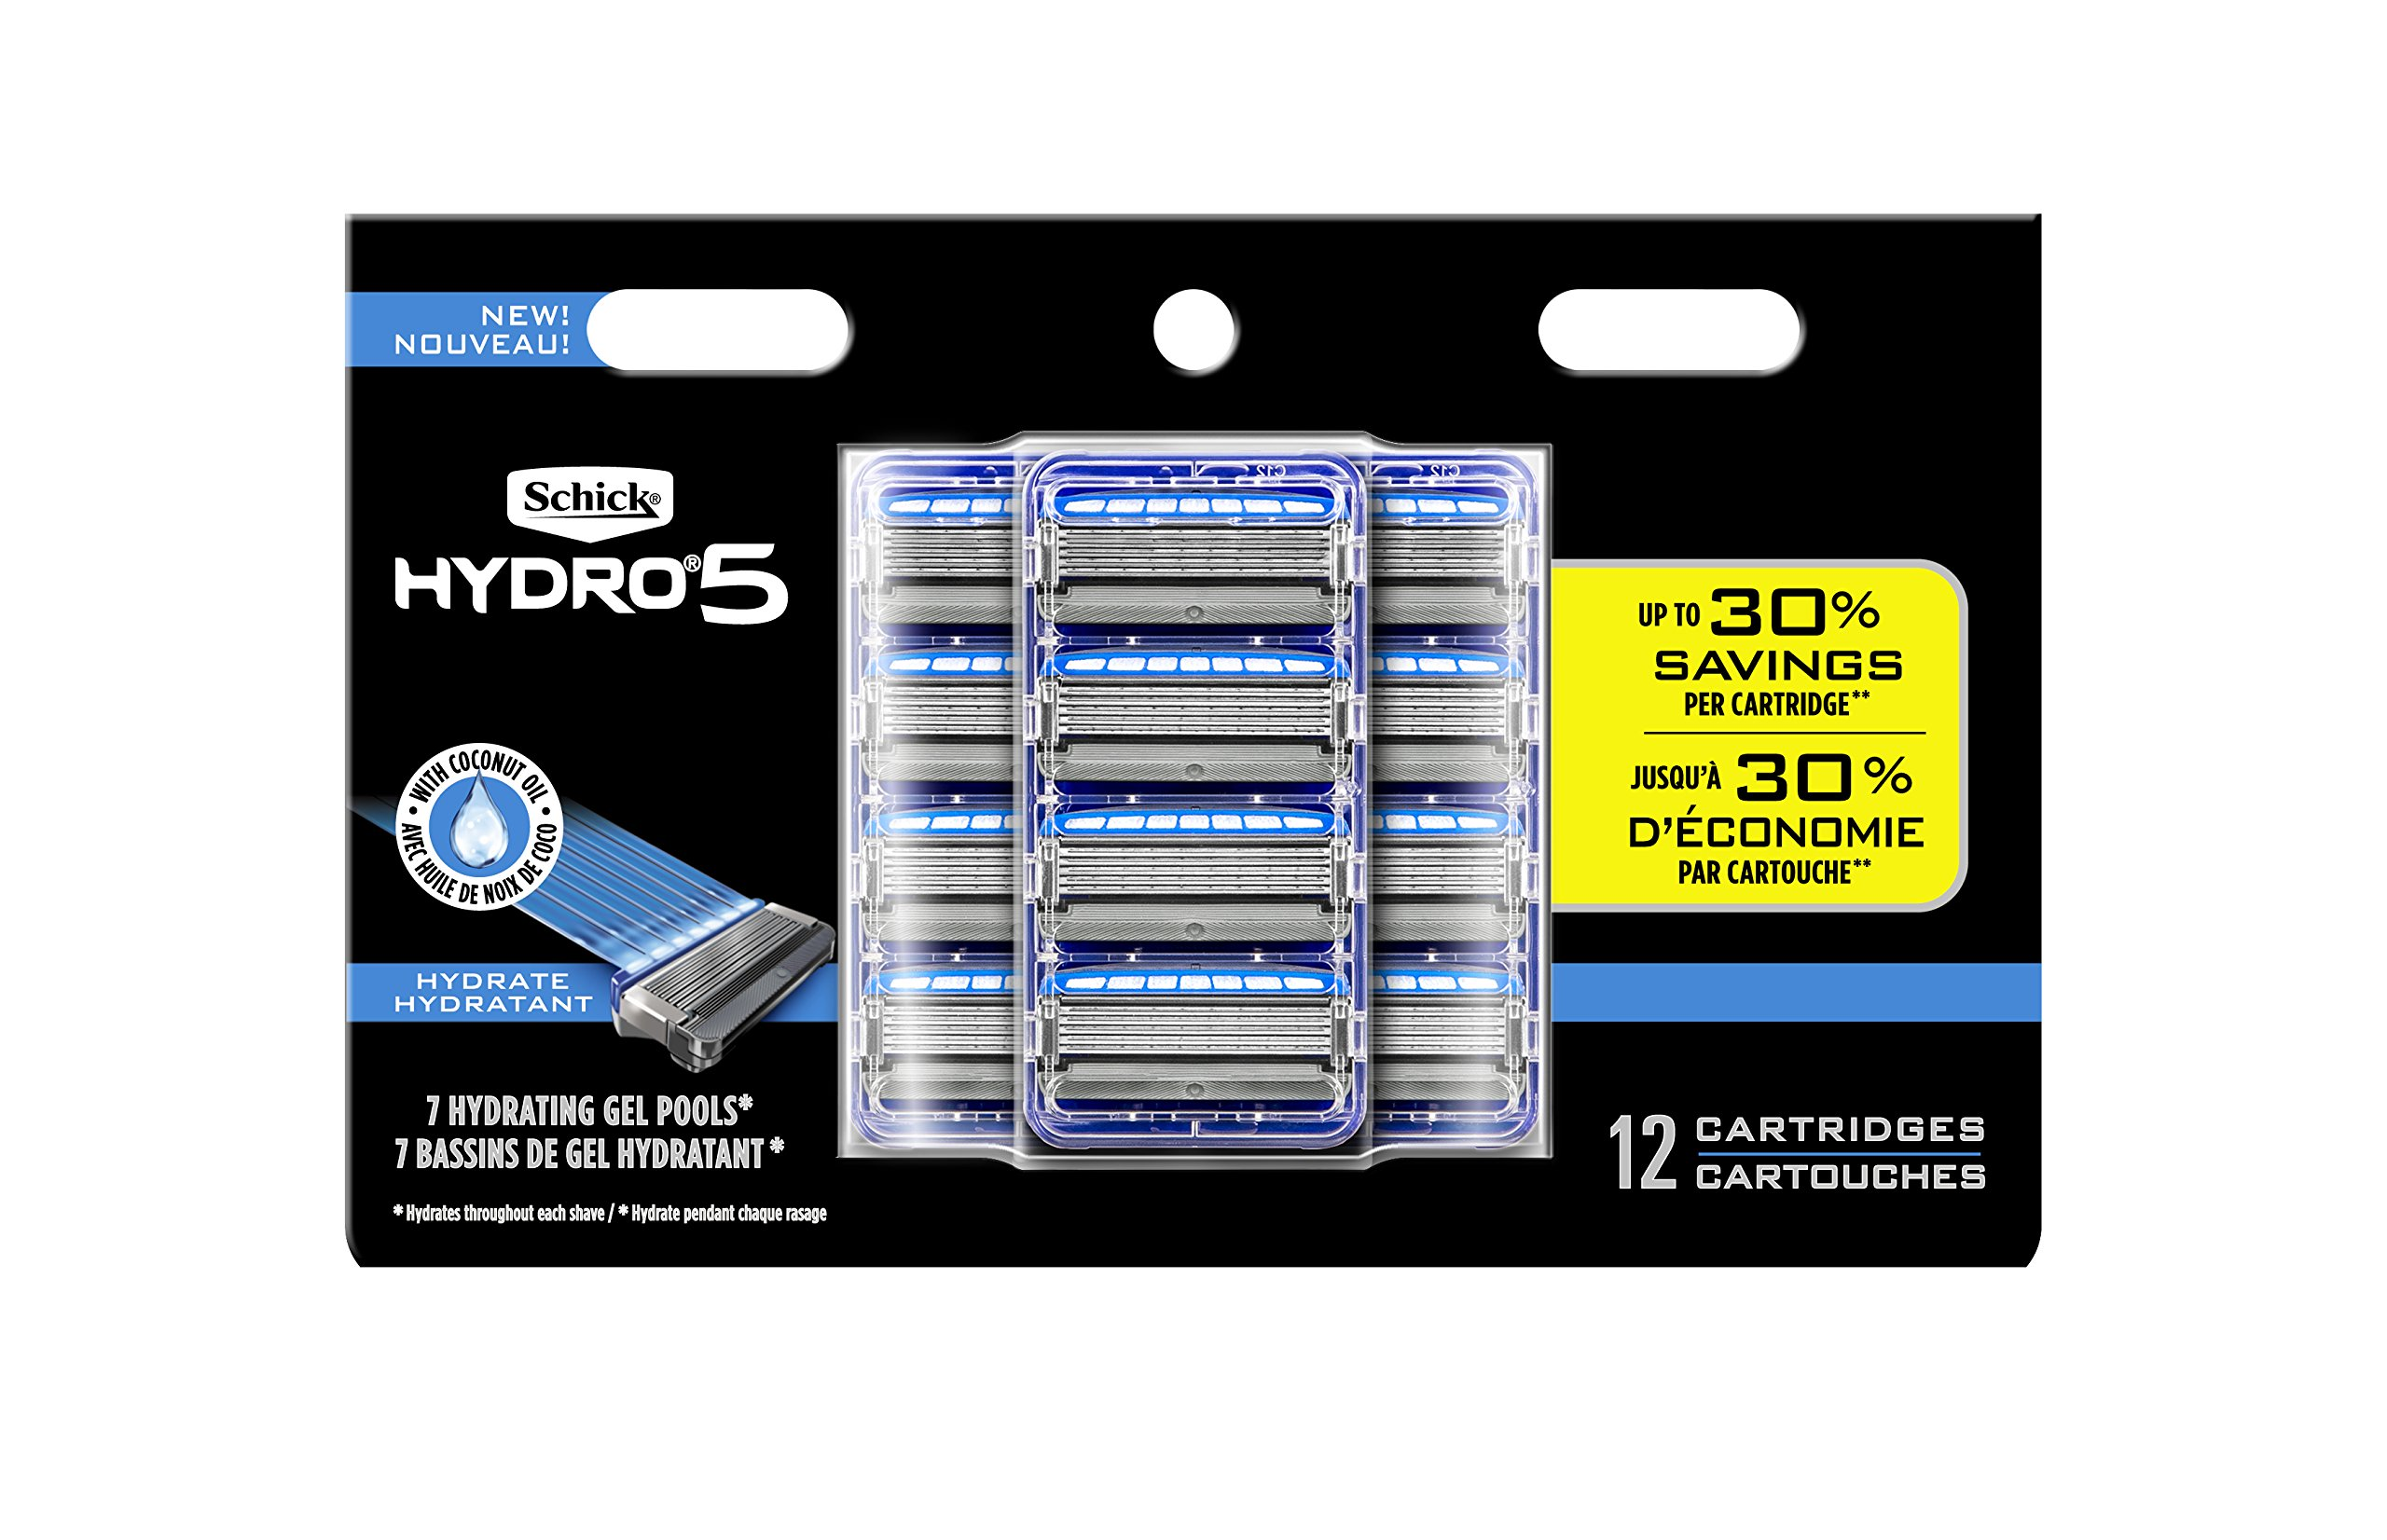 Schick Hydro 5 Sense Hydrate Razor Refills for Men, Pack of 12 by Schick